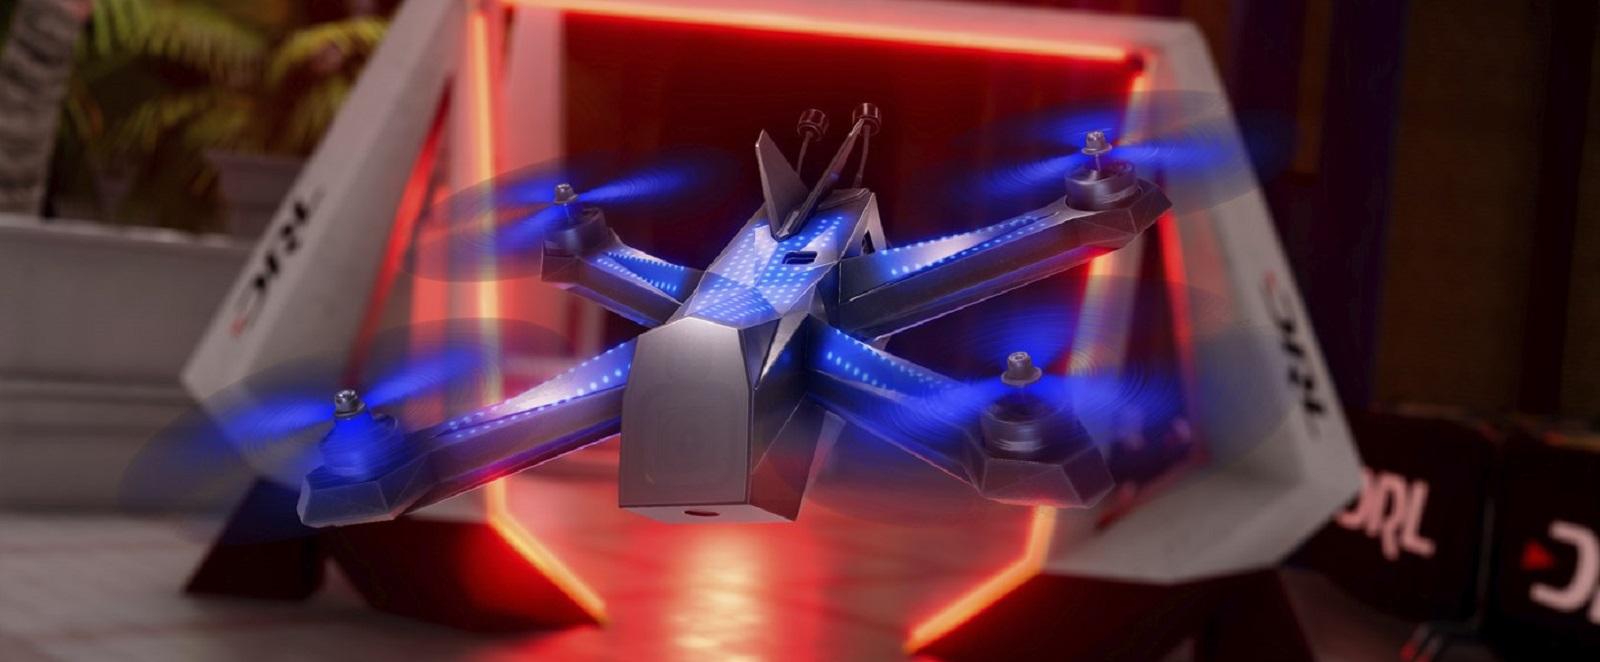 Симулятор Drone Racing League теперь доступен на Xbox